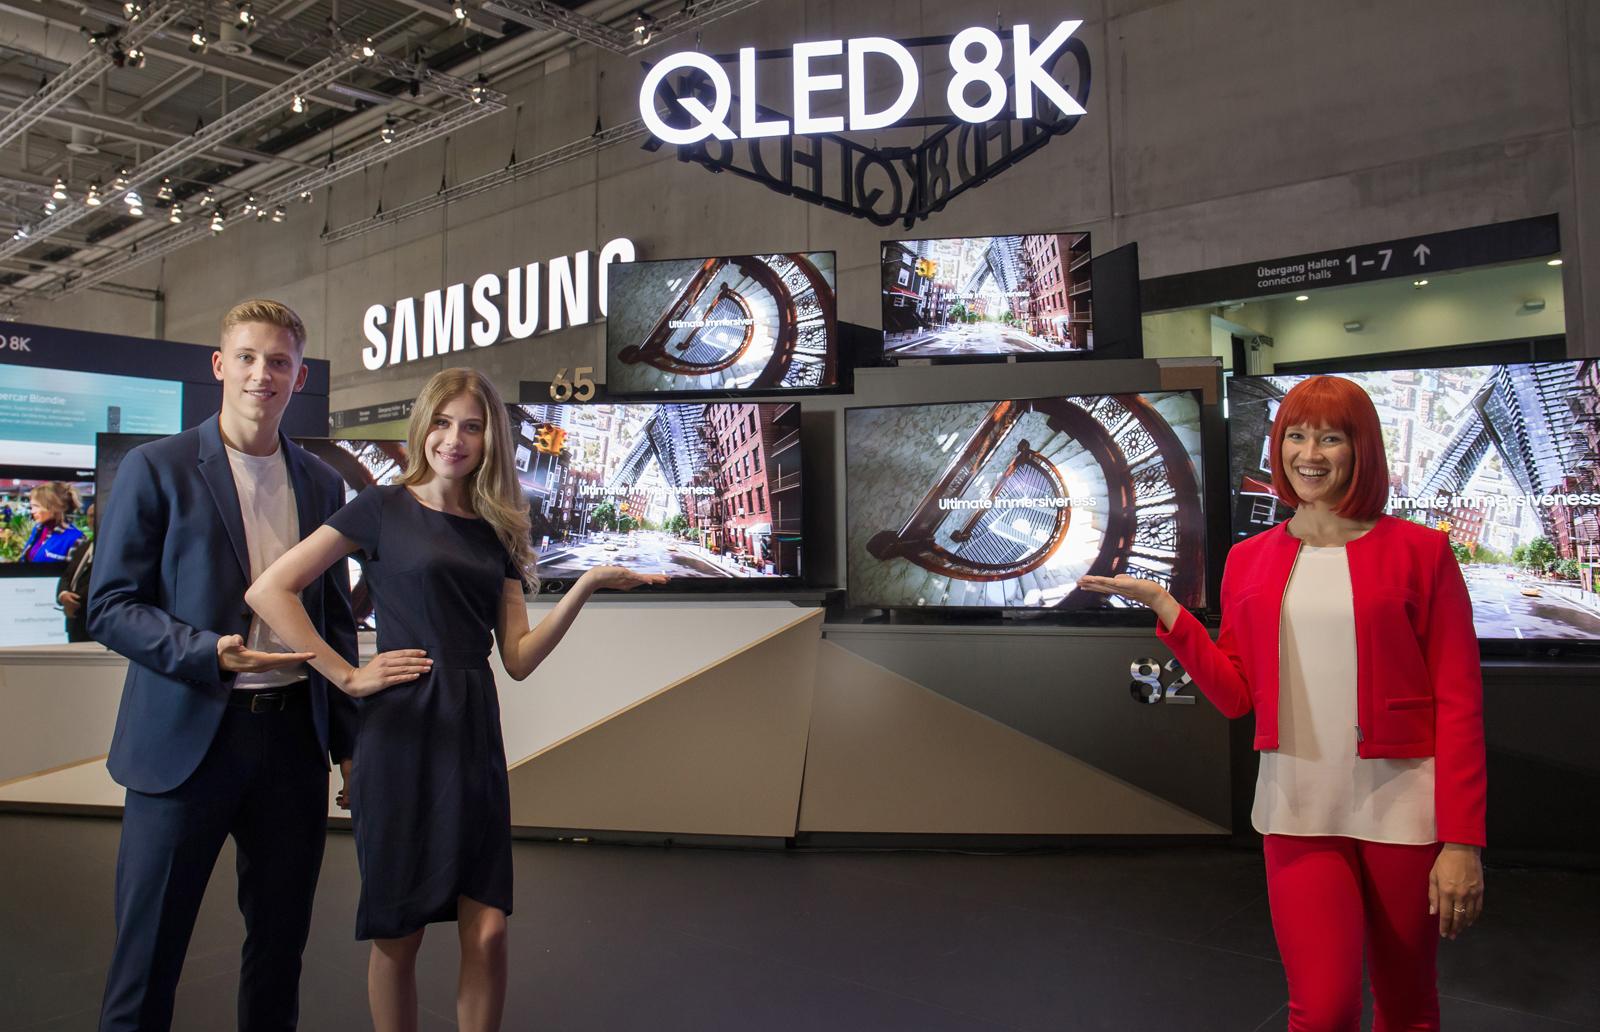 telewizor-Samsung-QLED-8K-IFA-2019_01